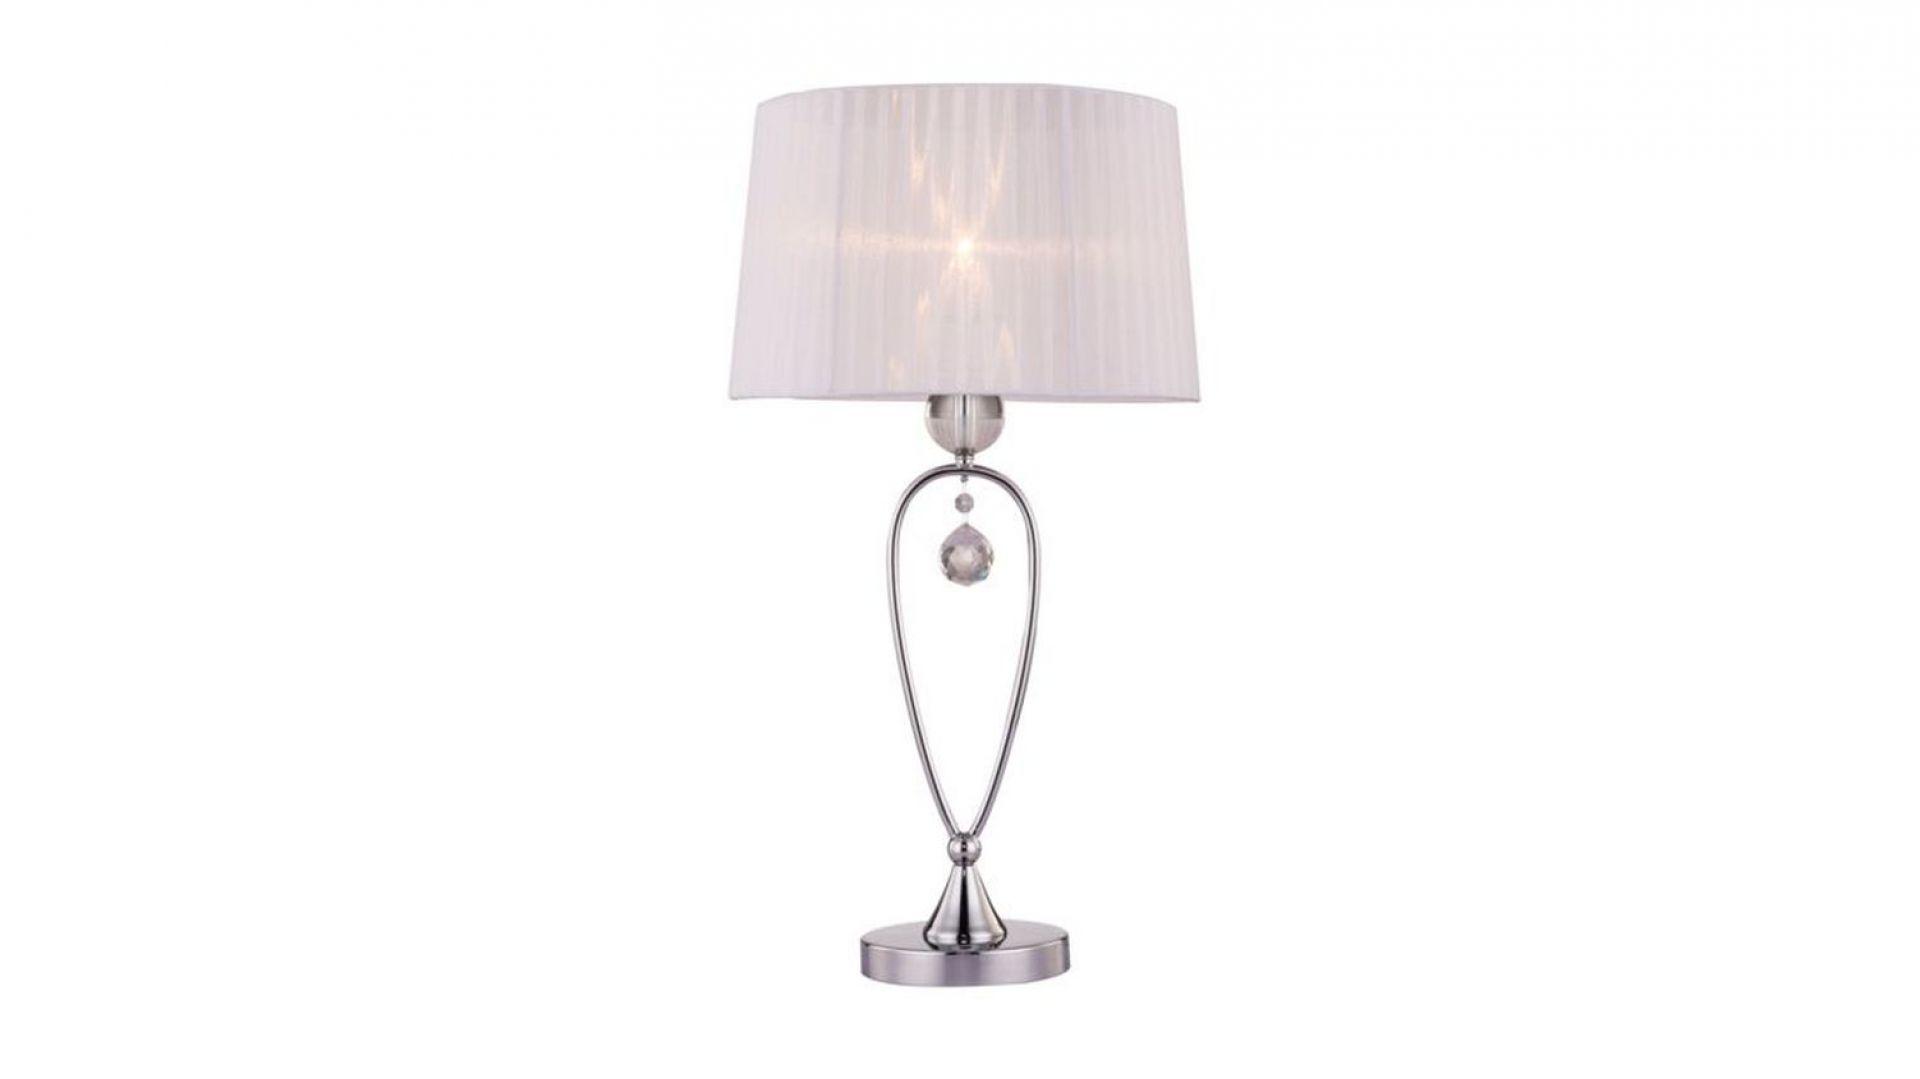 Lampa stołowa Bello. Fot. Agata S.A.